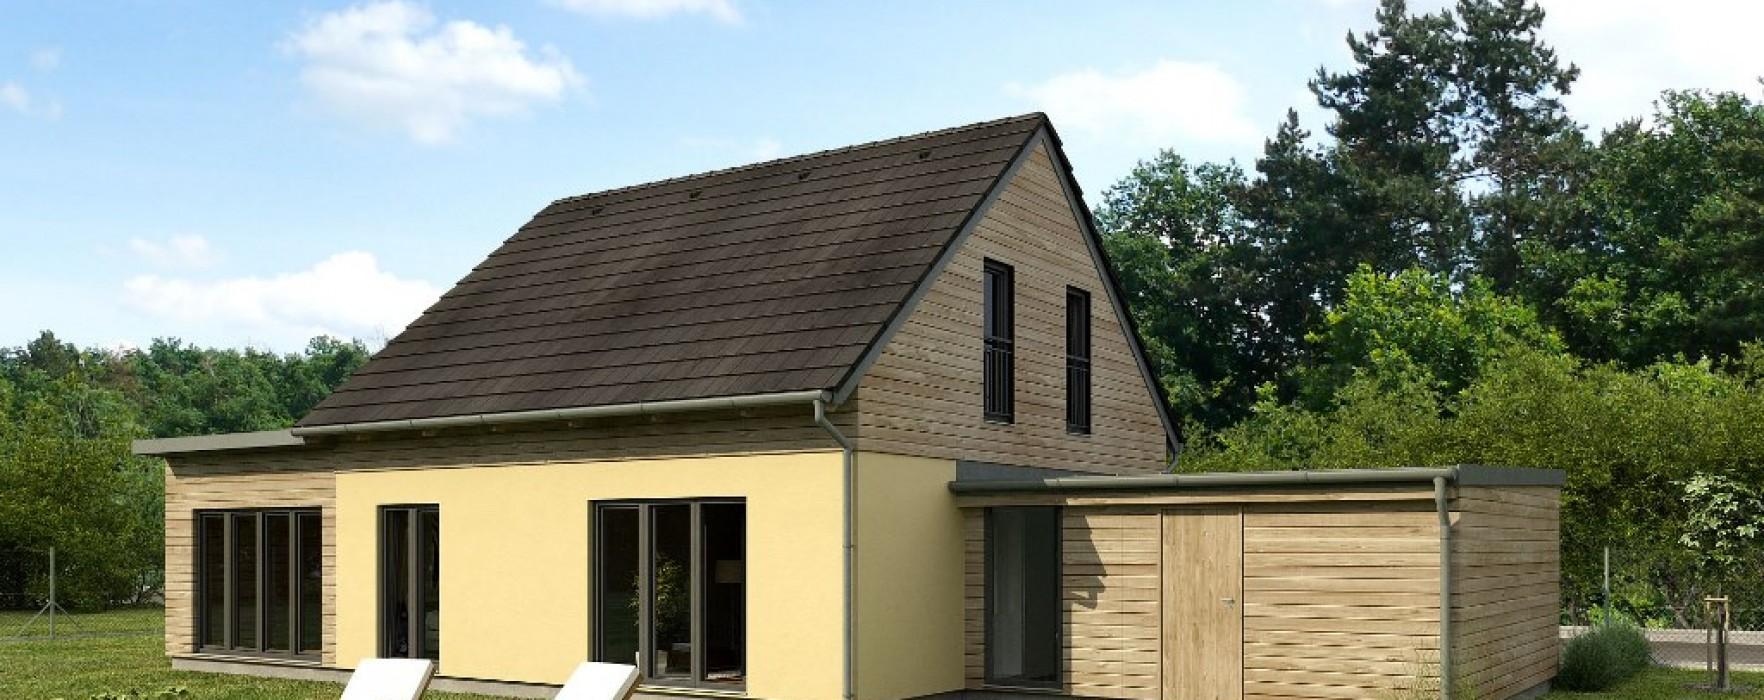 Grandi o piccole ditte di case prefabbricate for Piani di costruzione di piccole case